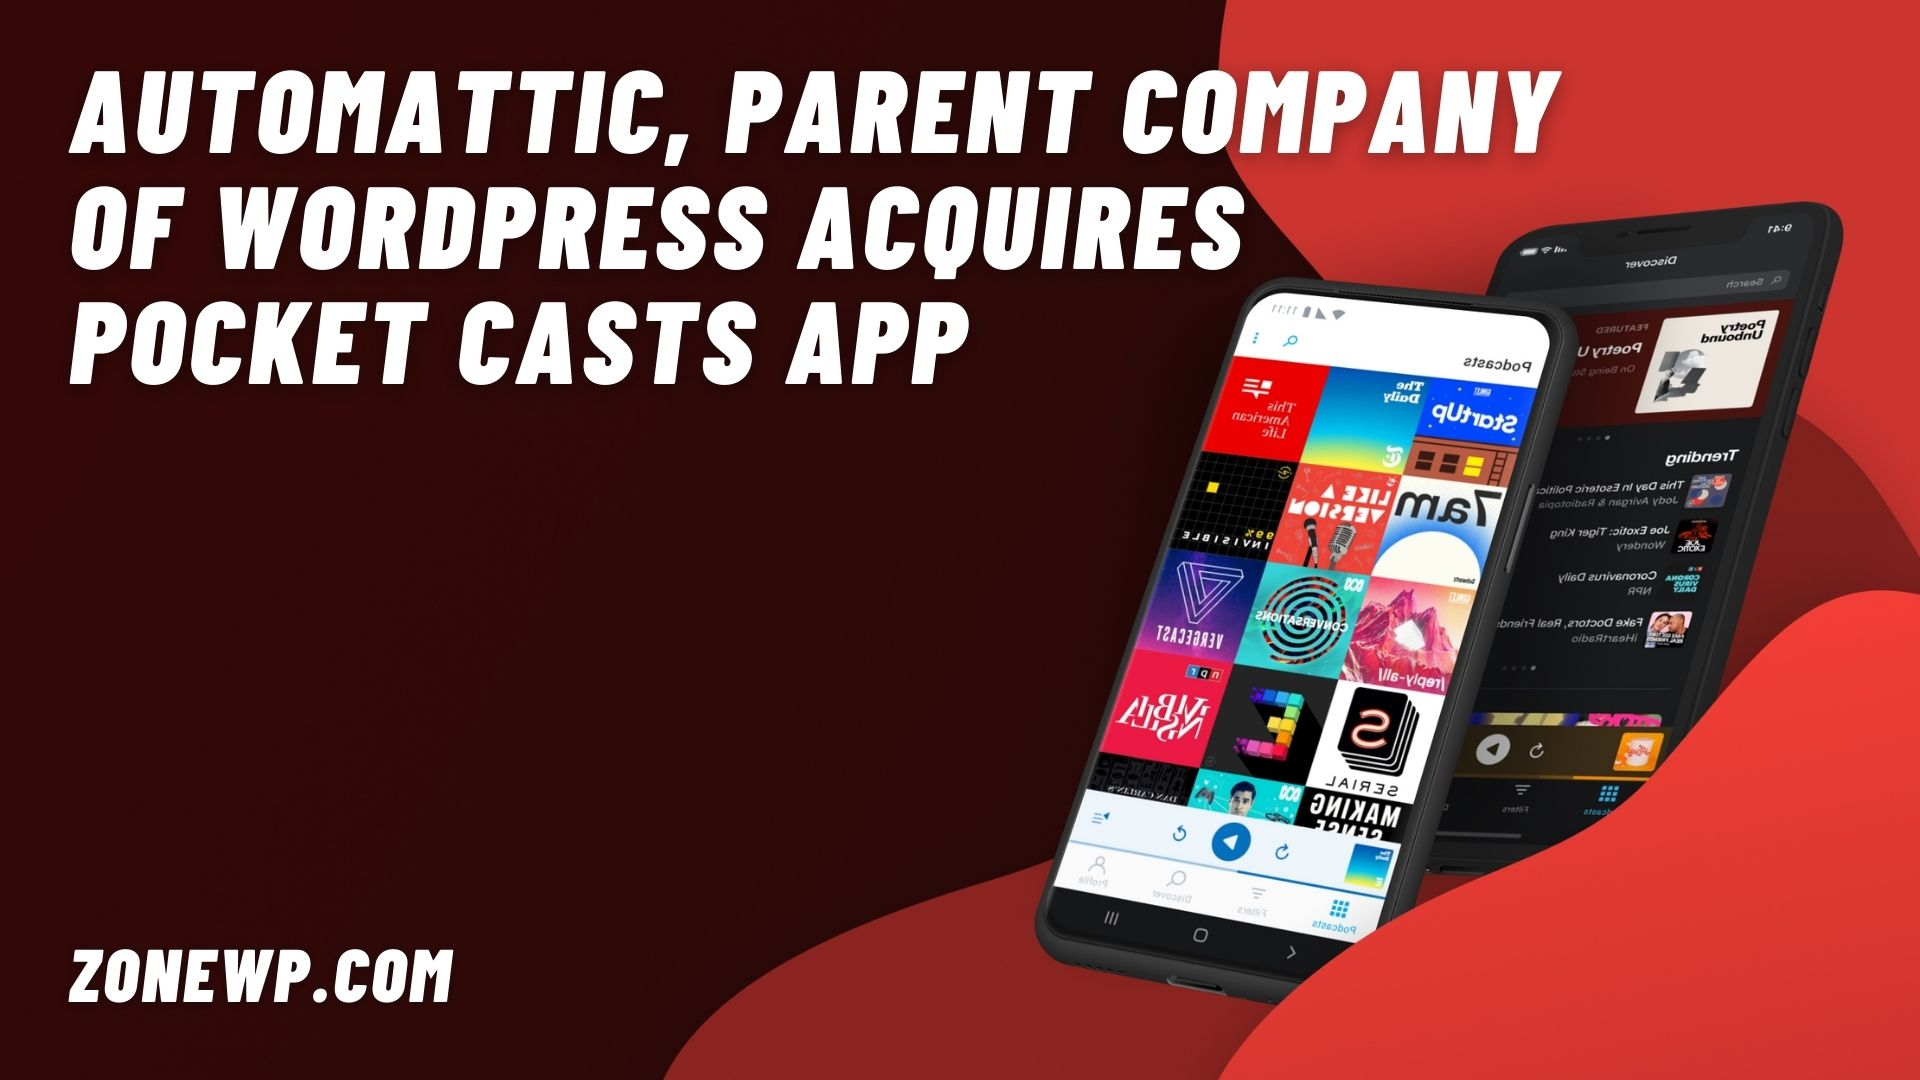 Automattic Acquires Pocket Casts